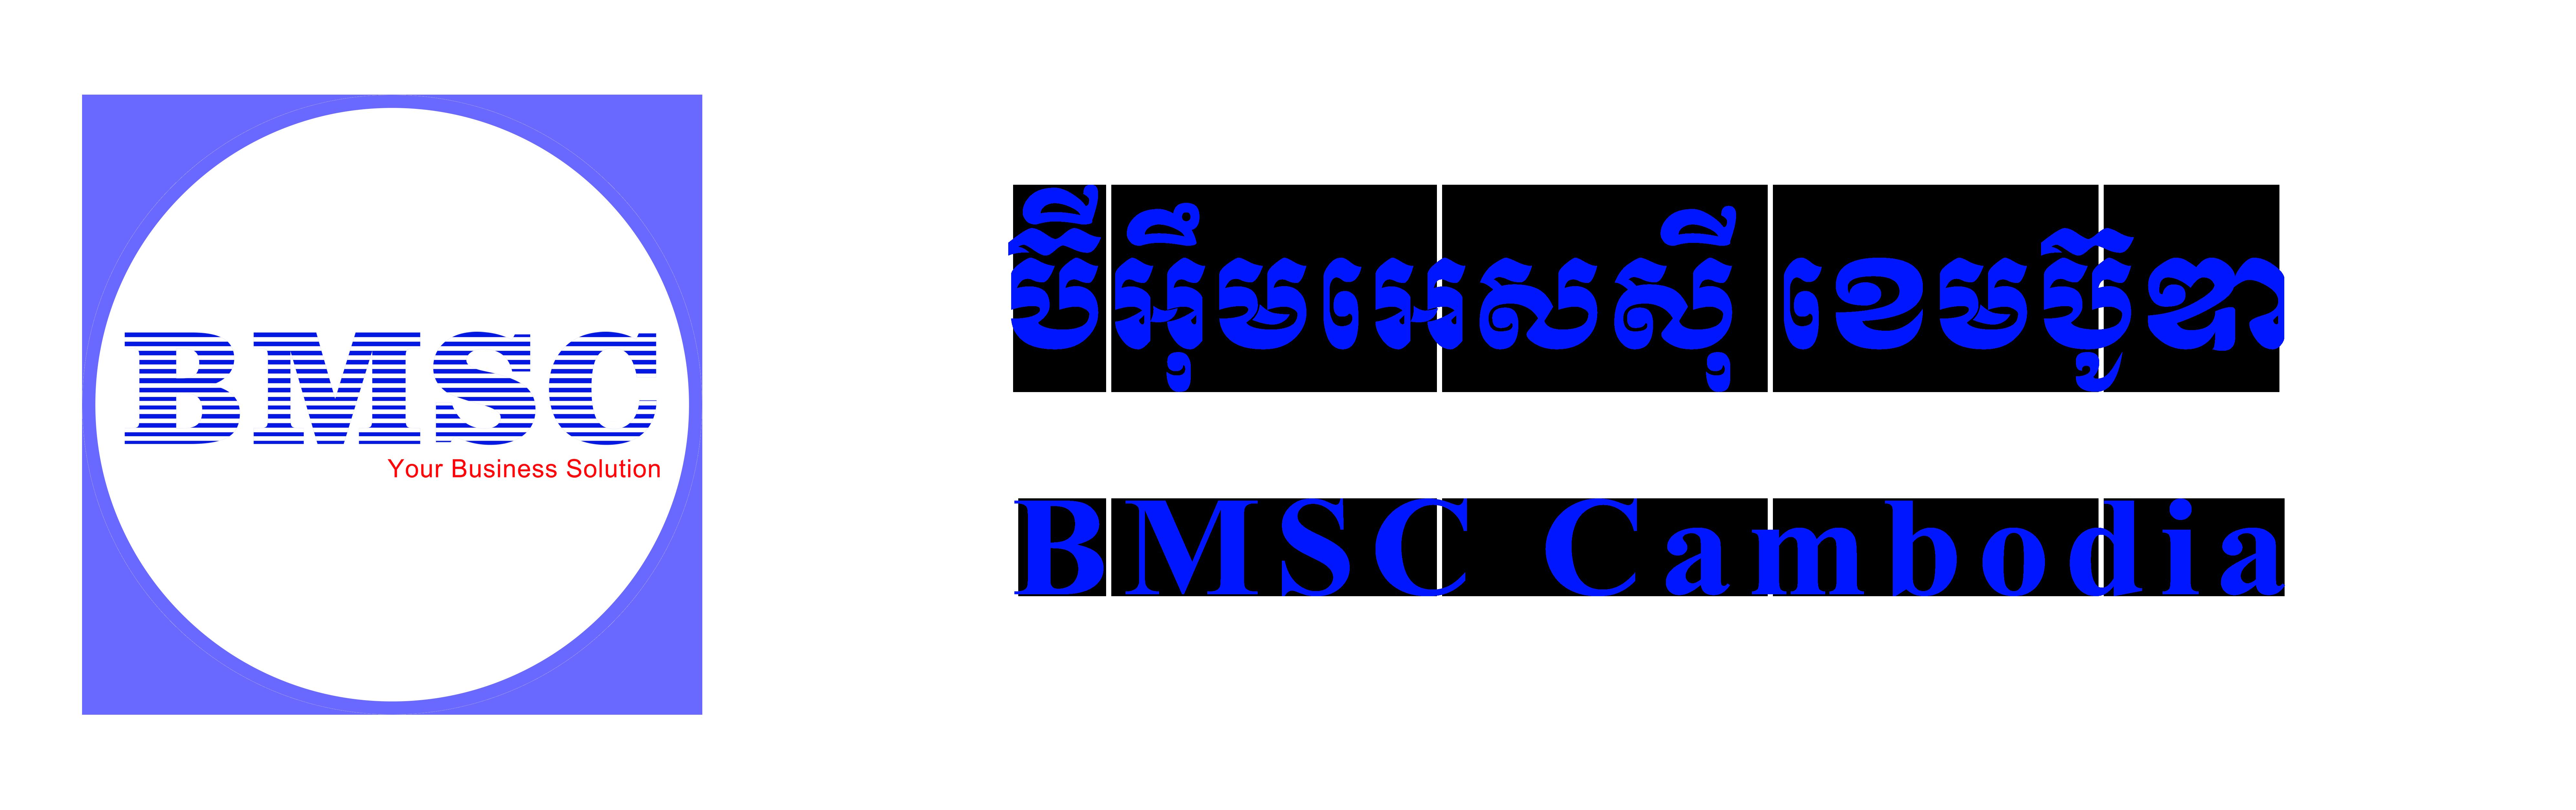 bmsc-cambodia.com